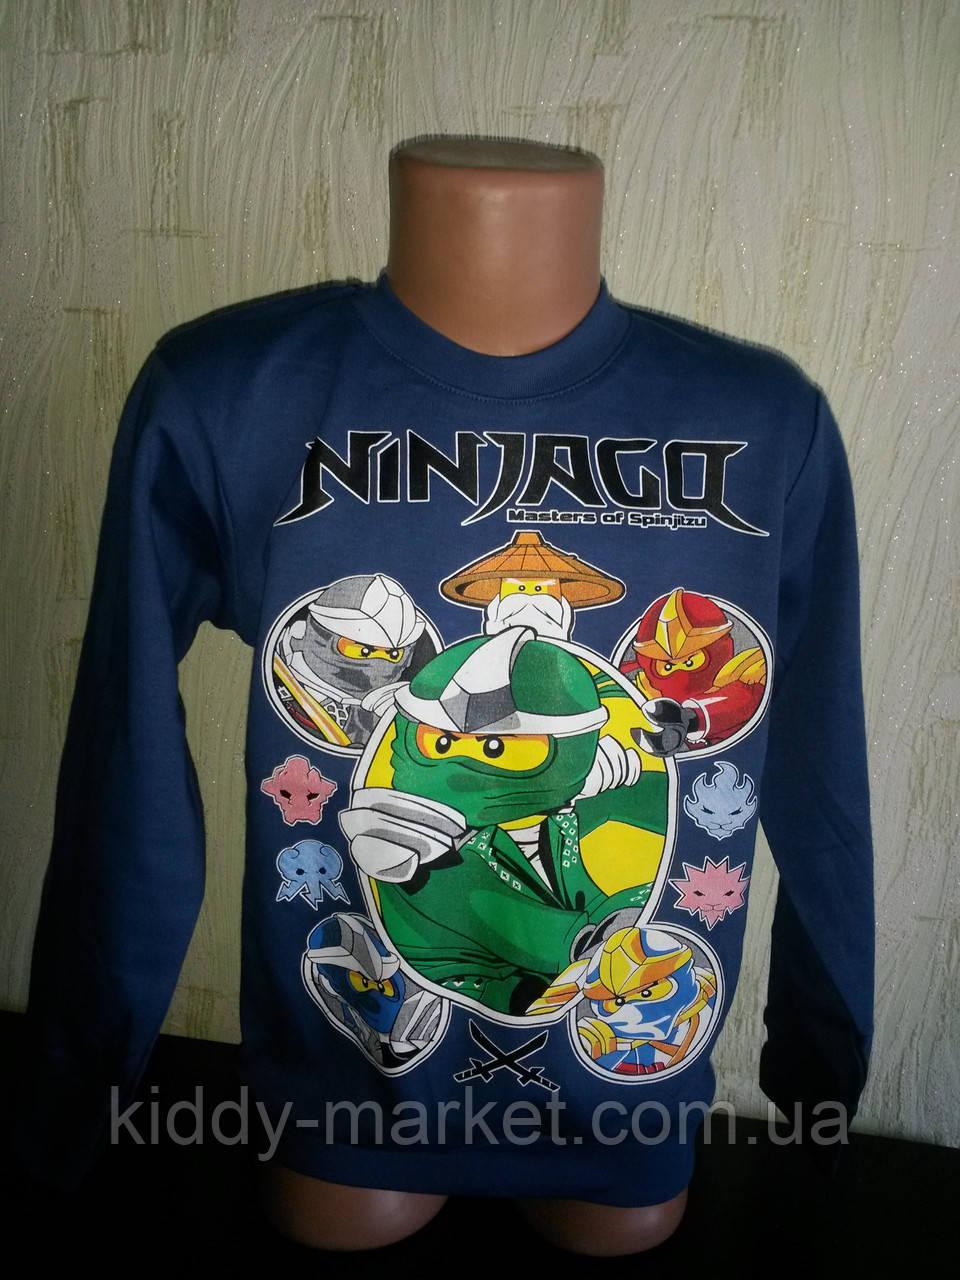 Джемпер  для мальчика Ниндзя го. Ninjago,Нинзяго 3-5  лет